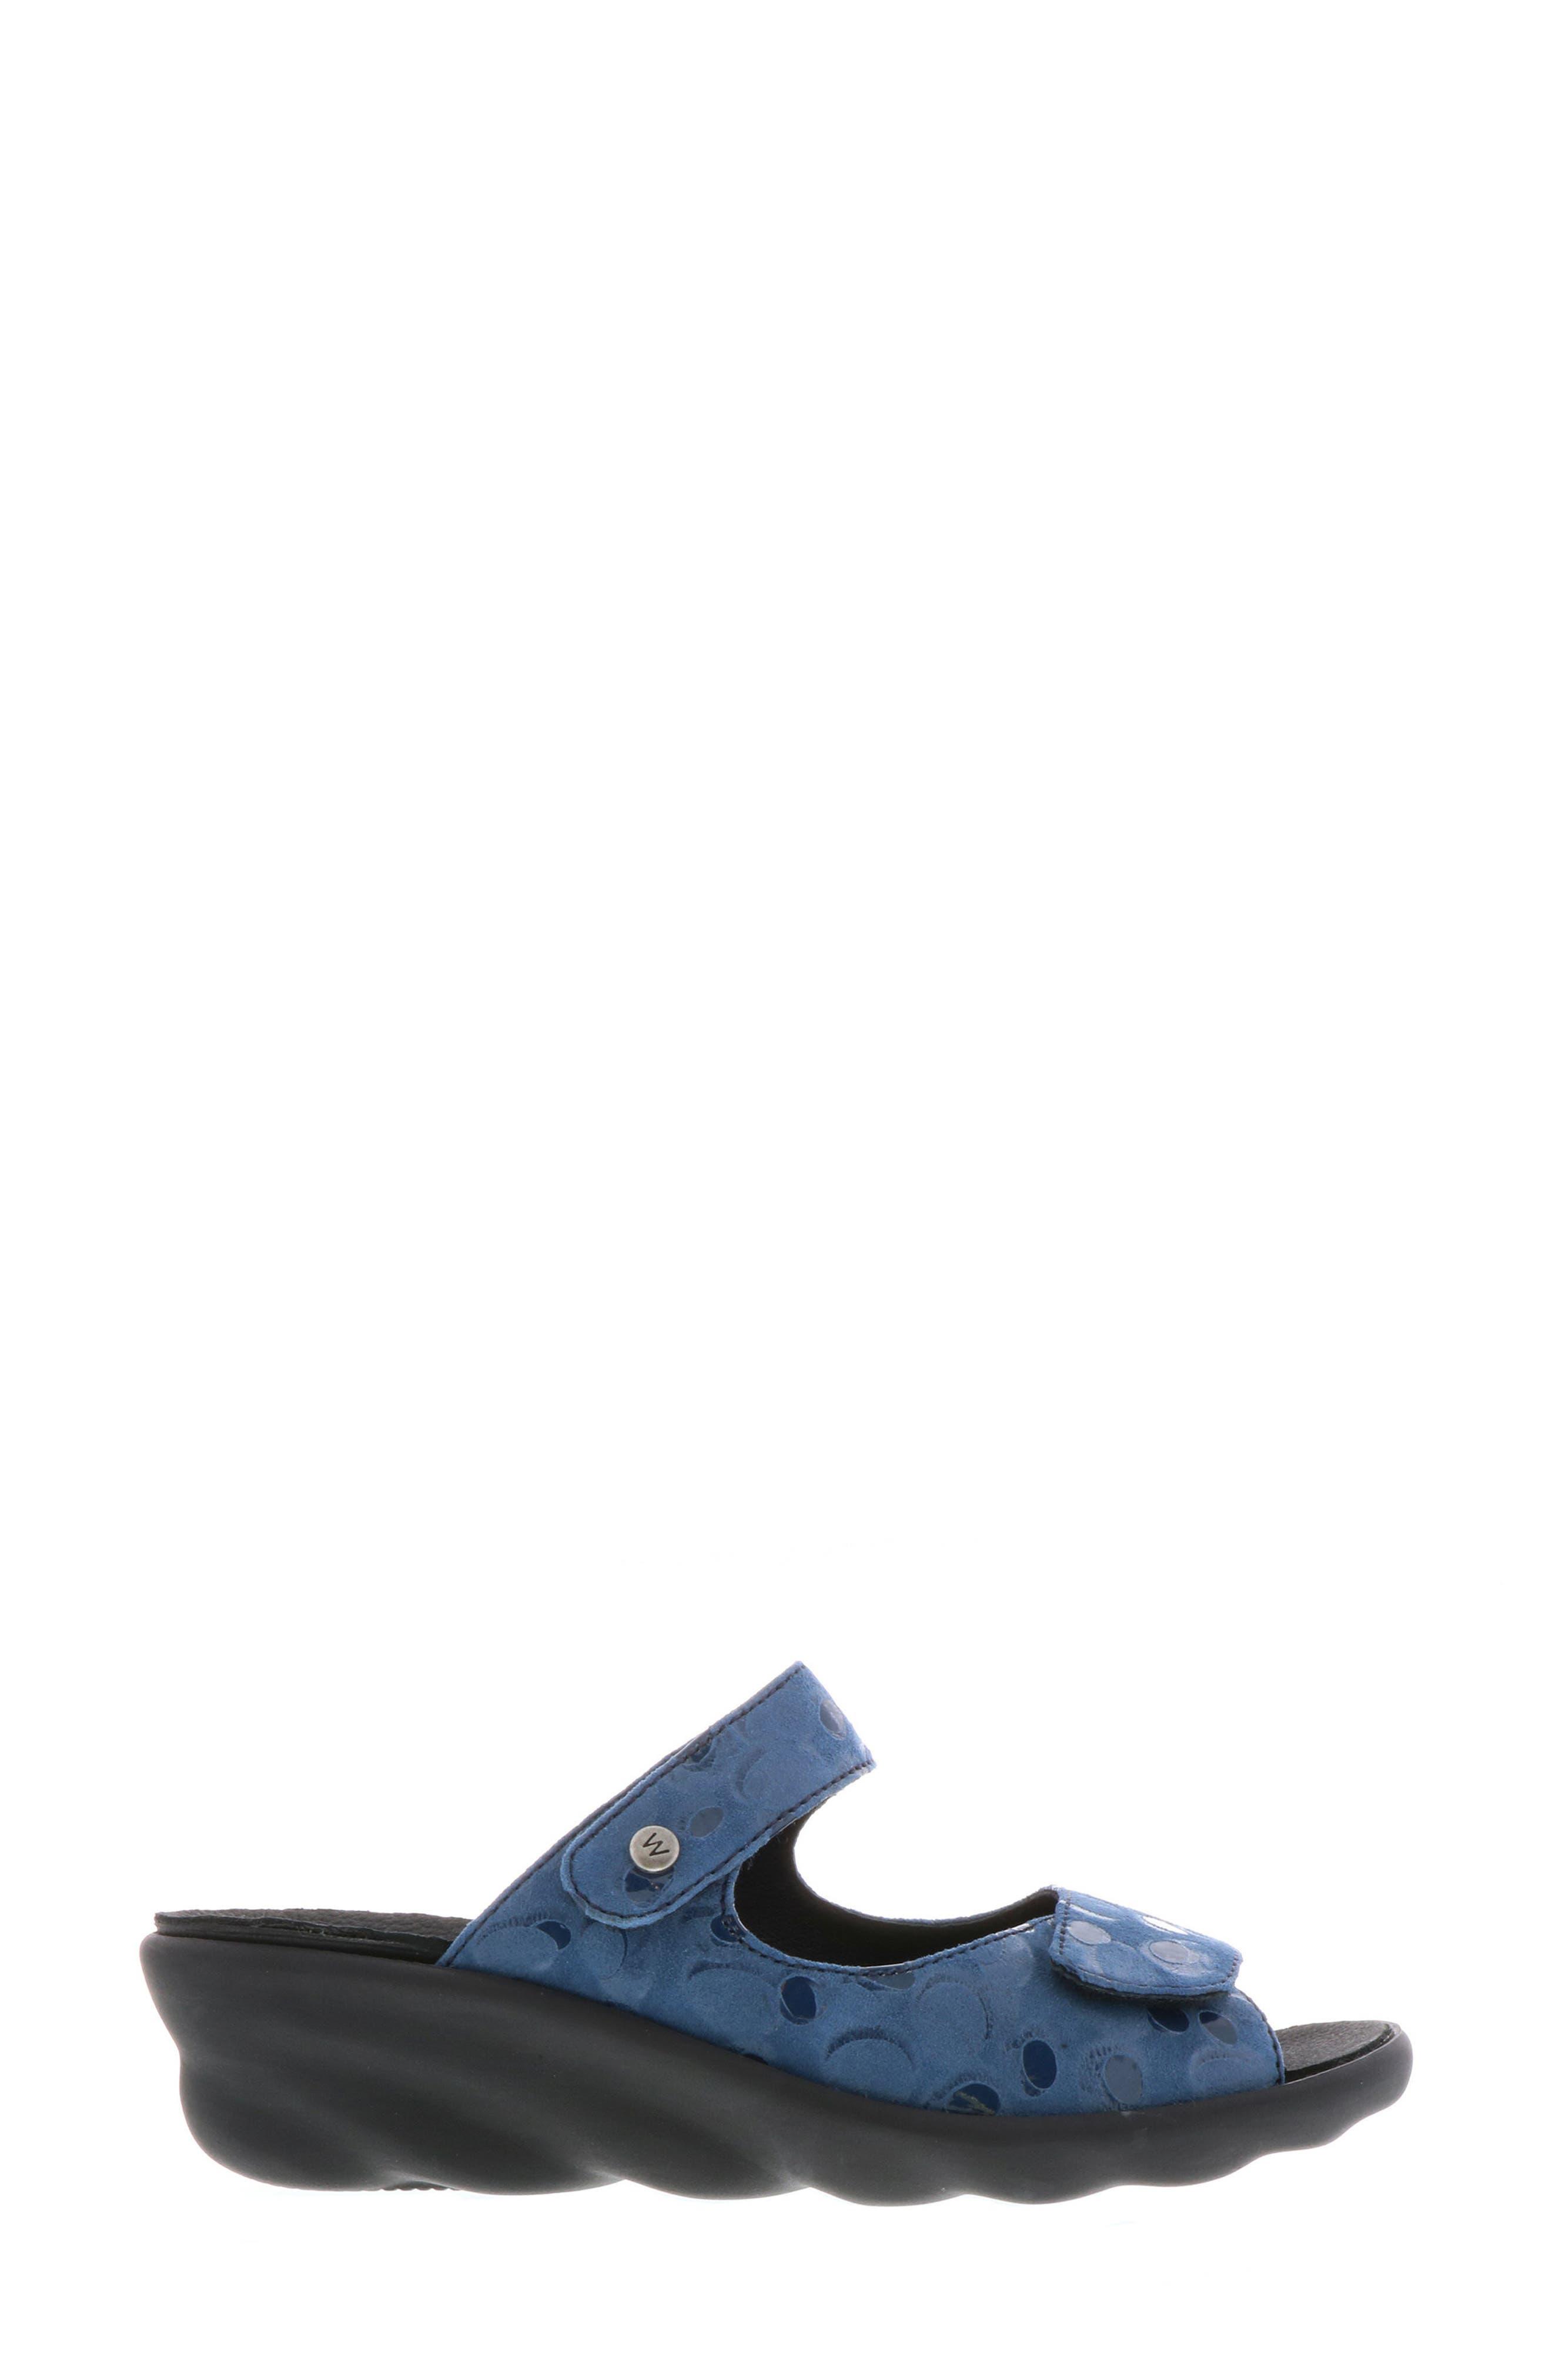 Bolena Slide Sandal,                             Alternate thumbnail 3, color,                             Blue Circle Print